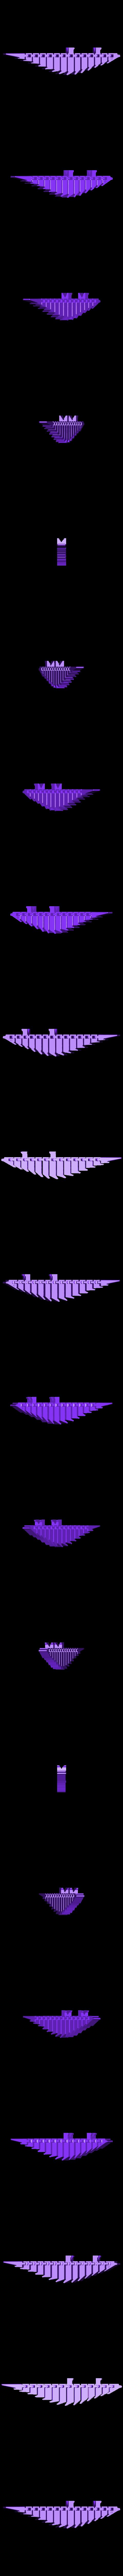 pangolins-1.stl Download free STL file Twist & bendable pangolins by orangeteacher • 3D printable design, orangeteacher